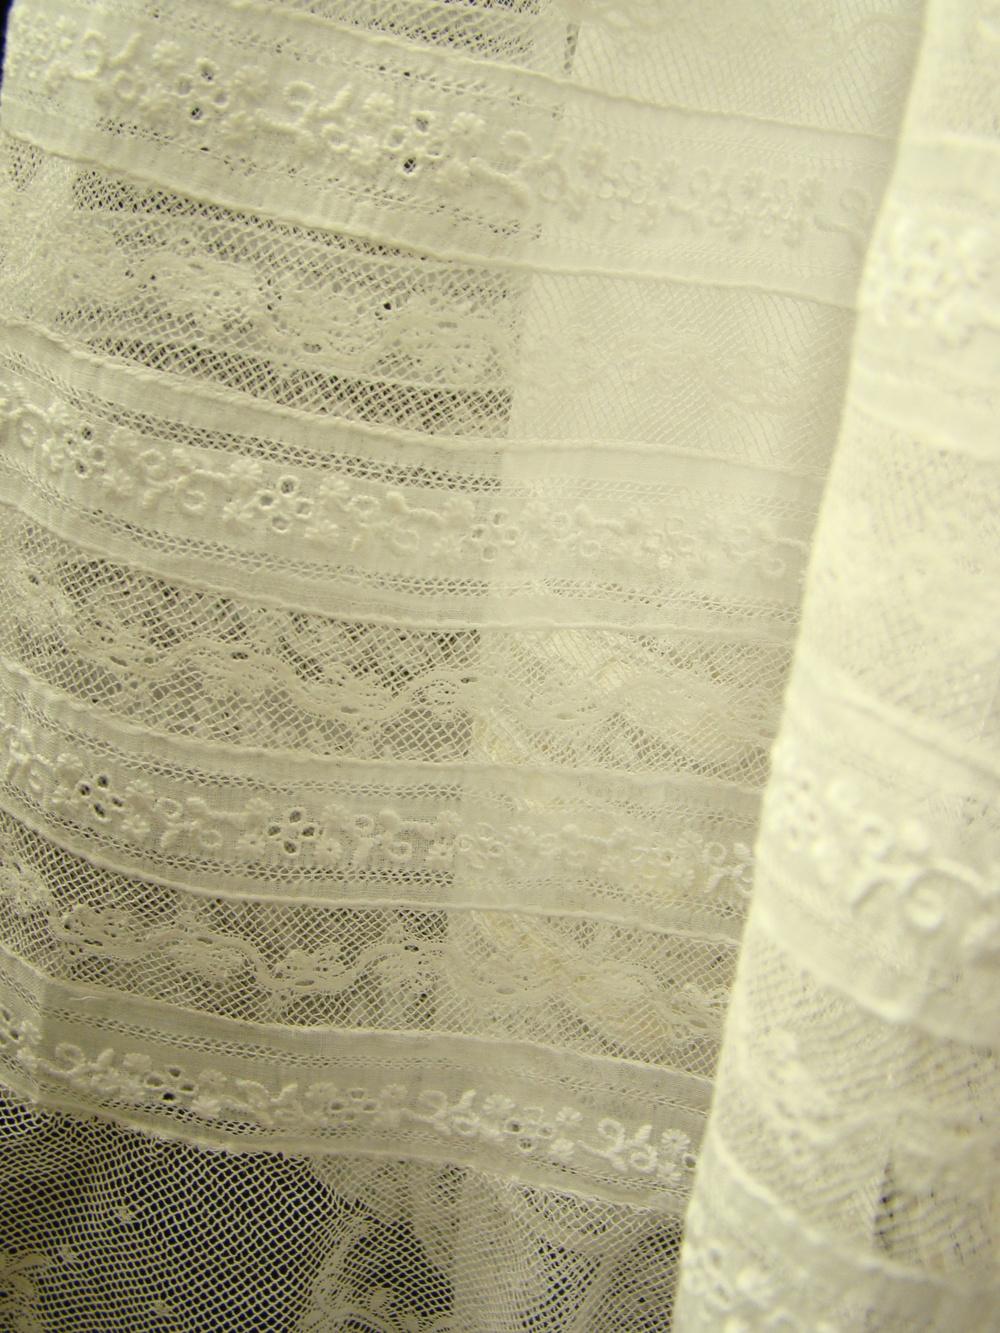 gowns3 062.JPG